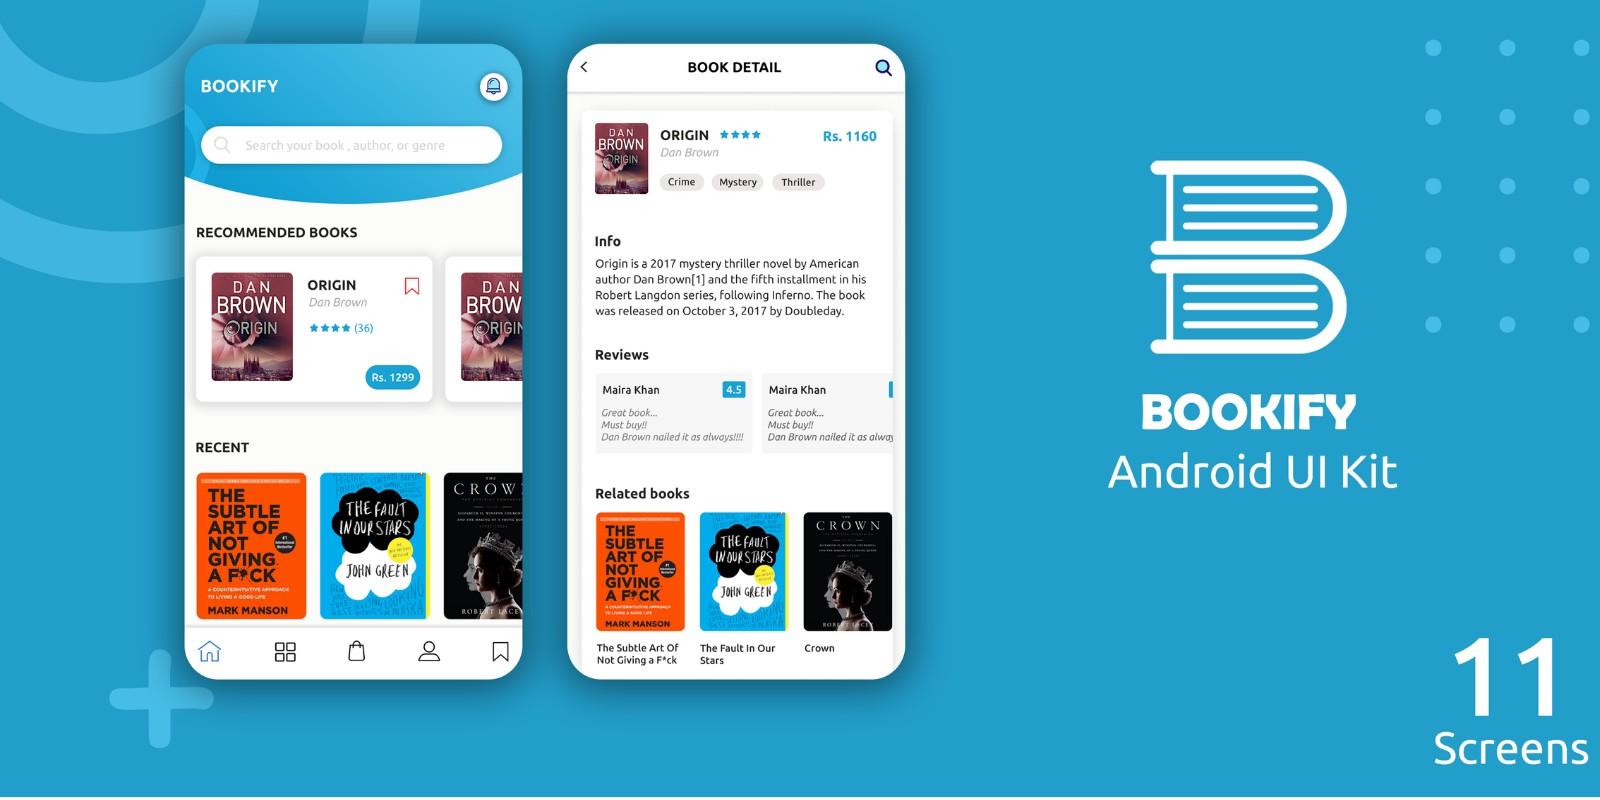 Bookify - Android Studio UI Kit